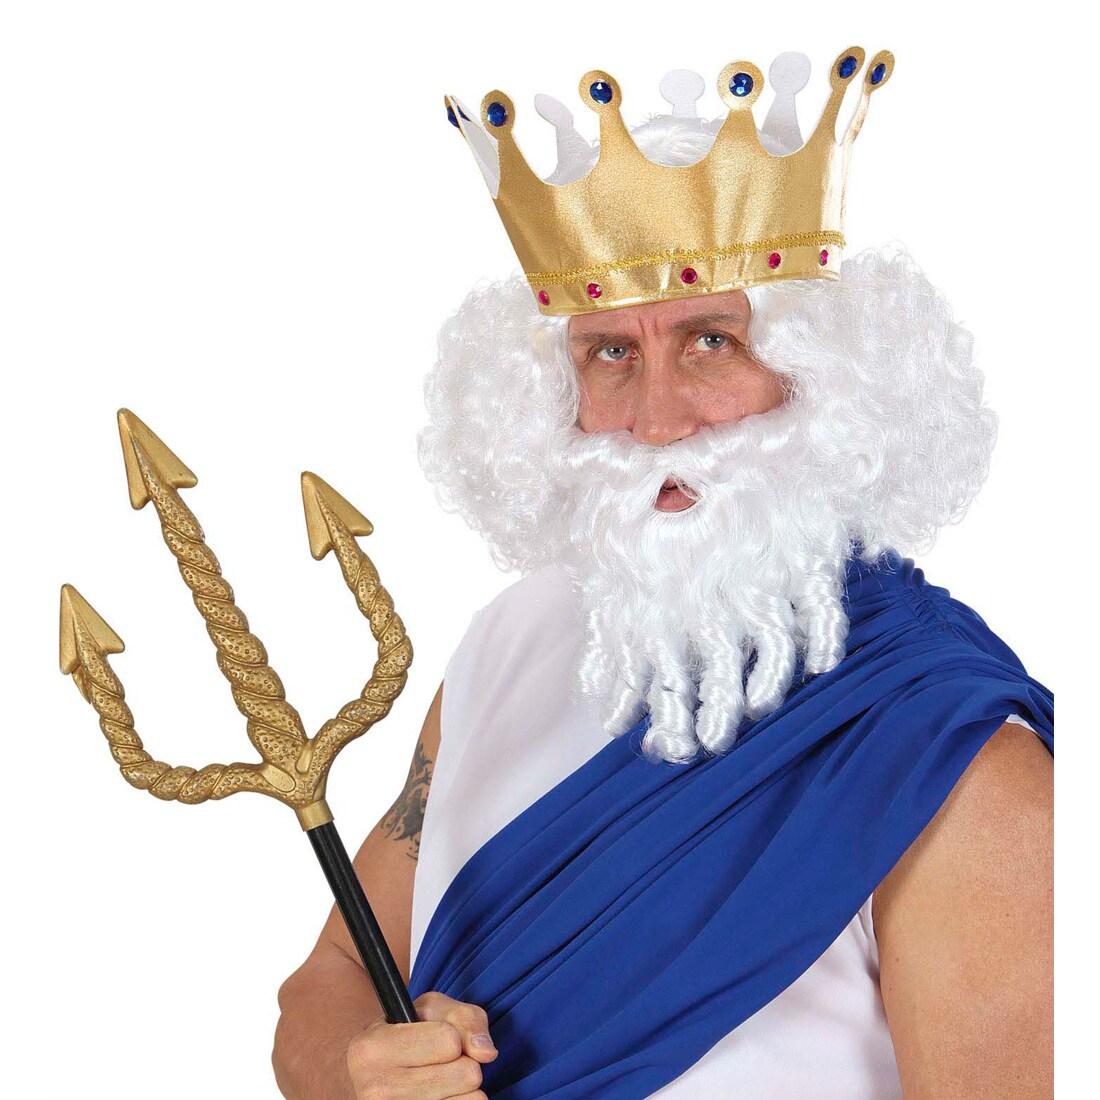 Zeus Perucke Konig Neptun Mit Bart Herrenperucke Fasching 15 99